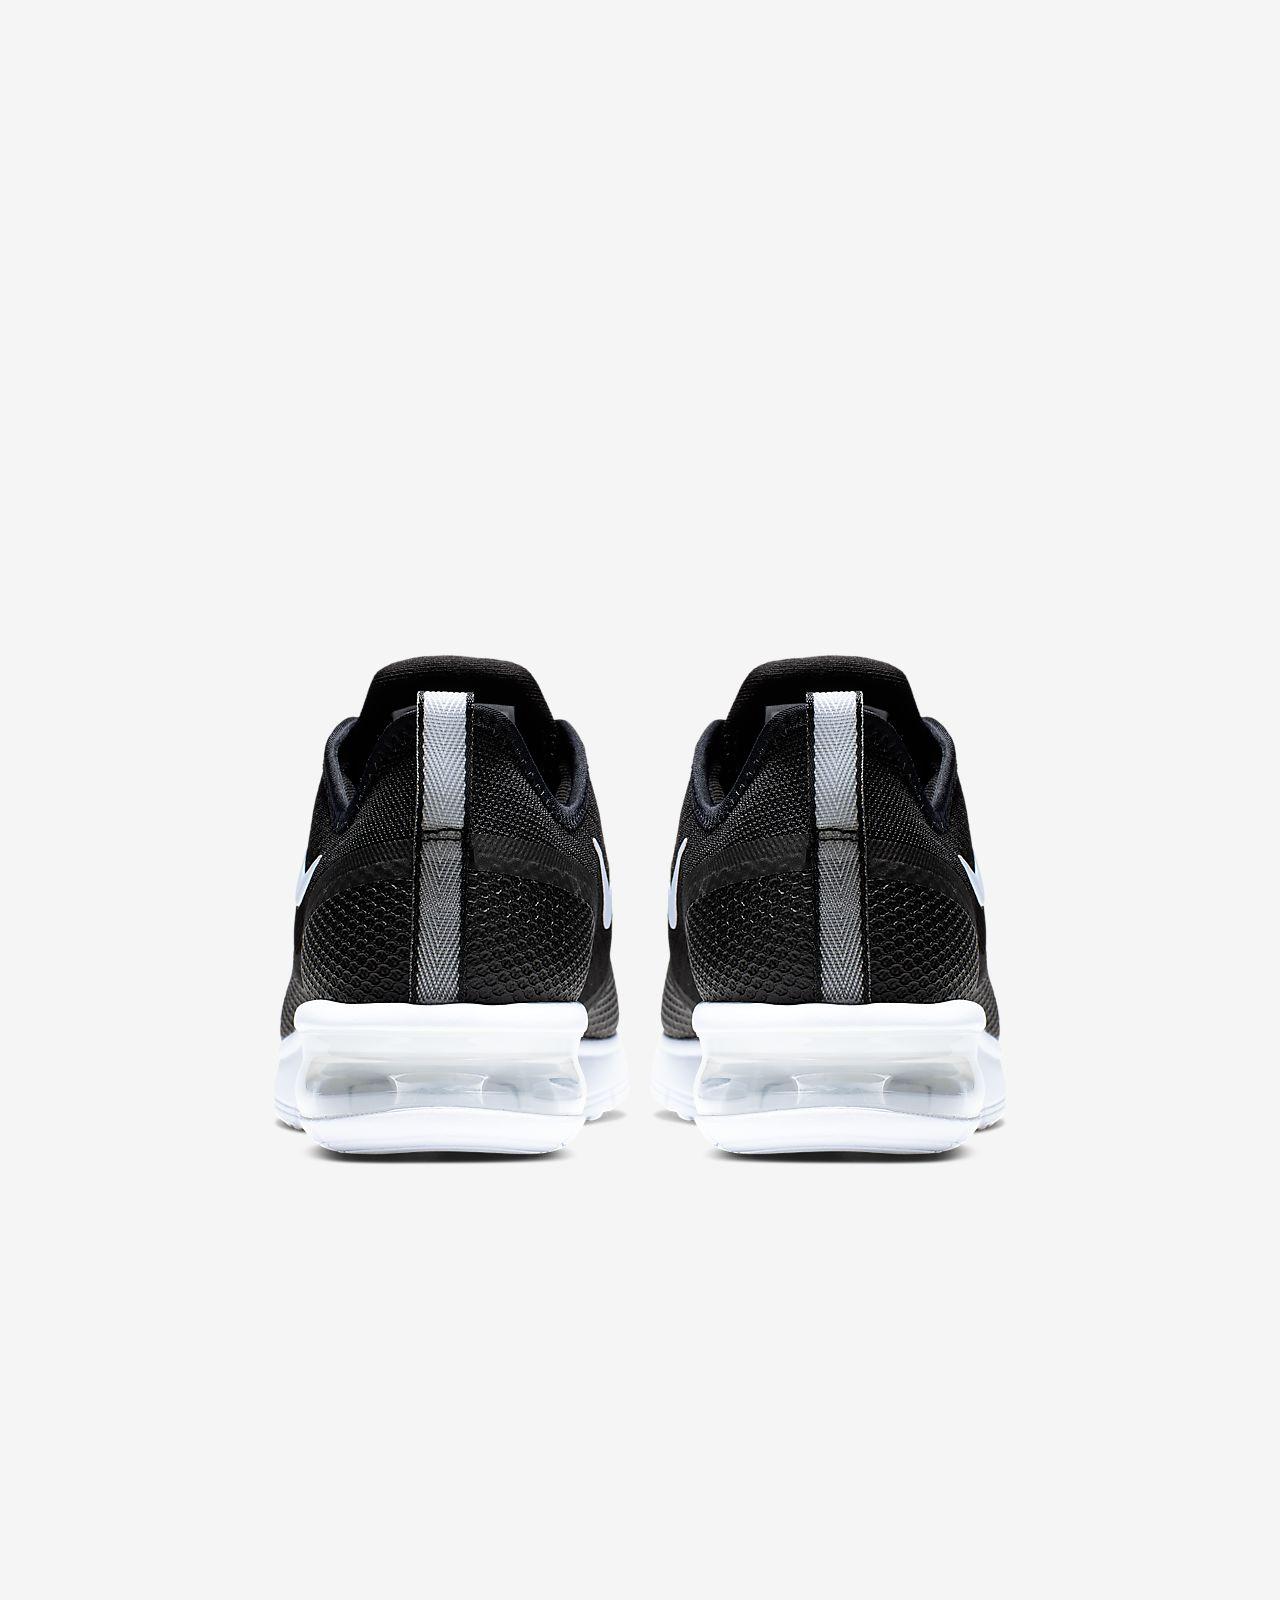 online retailer af3c4 86dc5 ... Löparsko Nike Air Max Sequent 4.5 för män